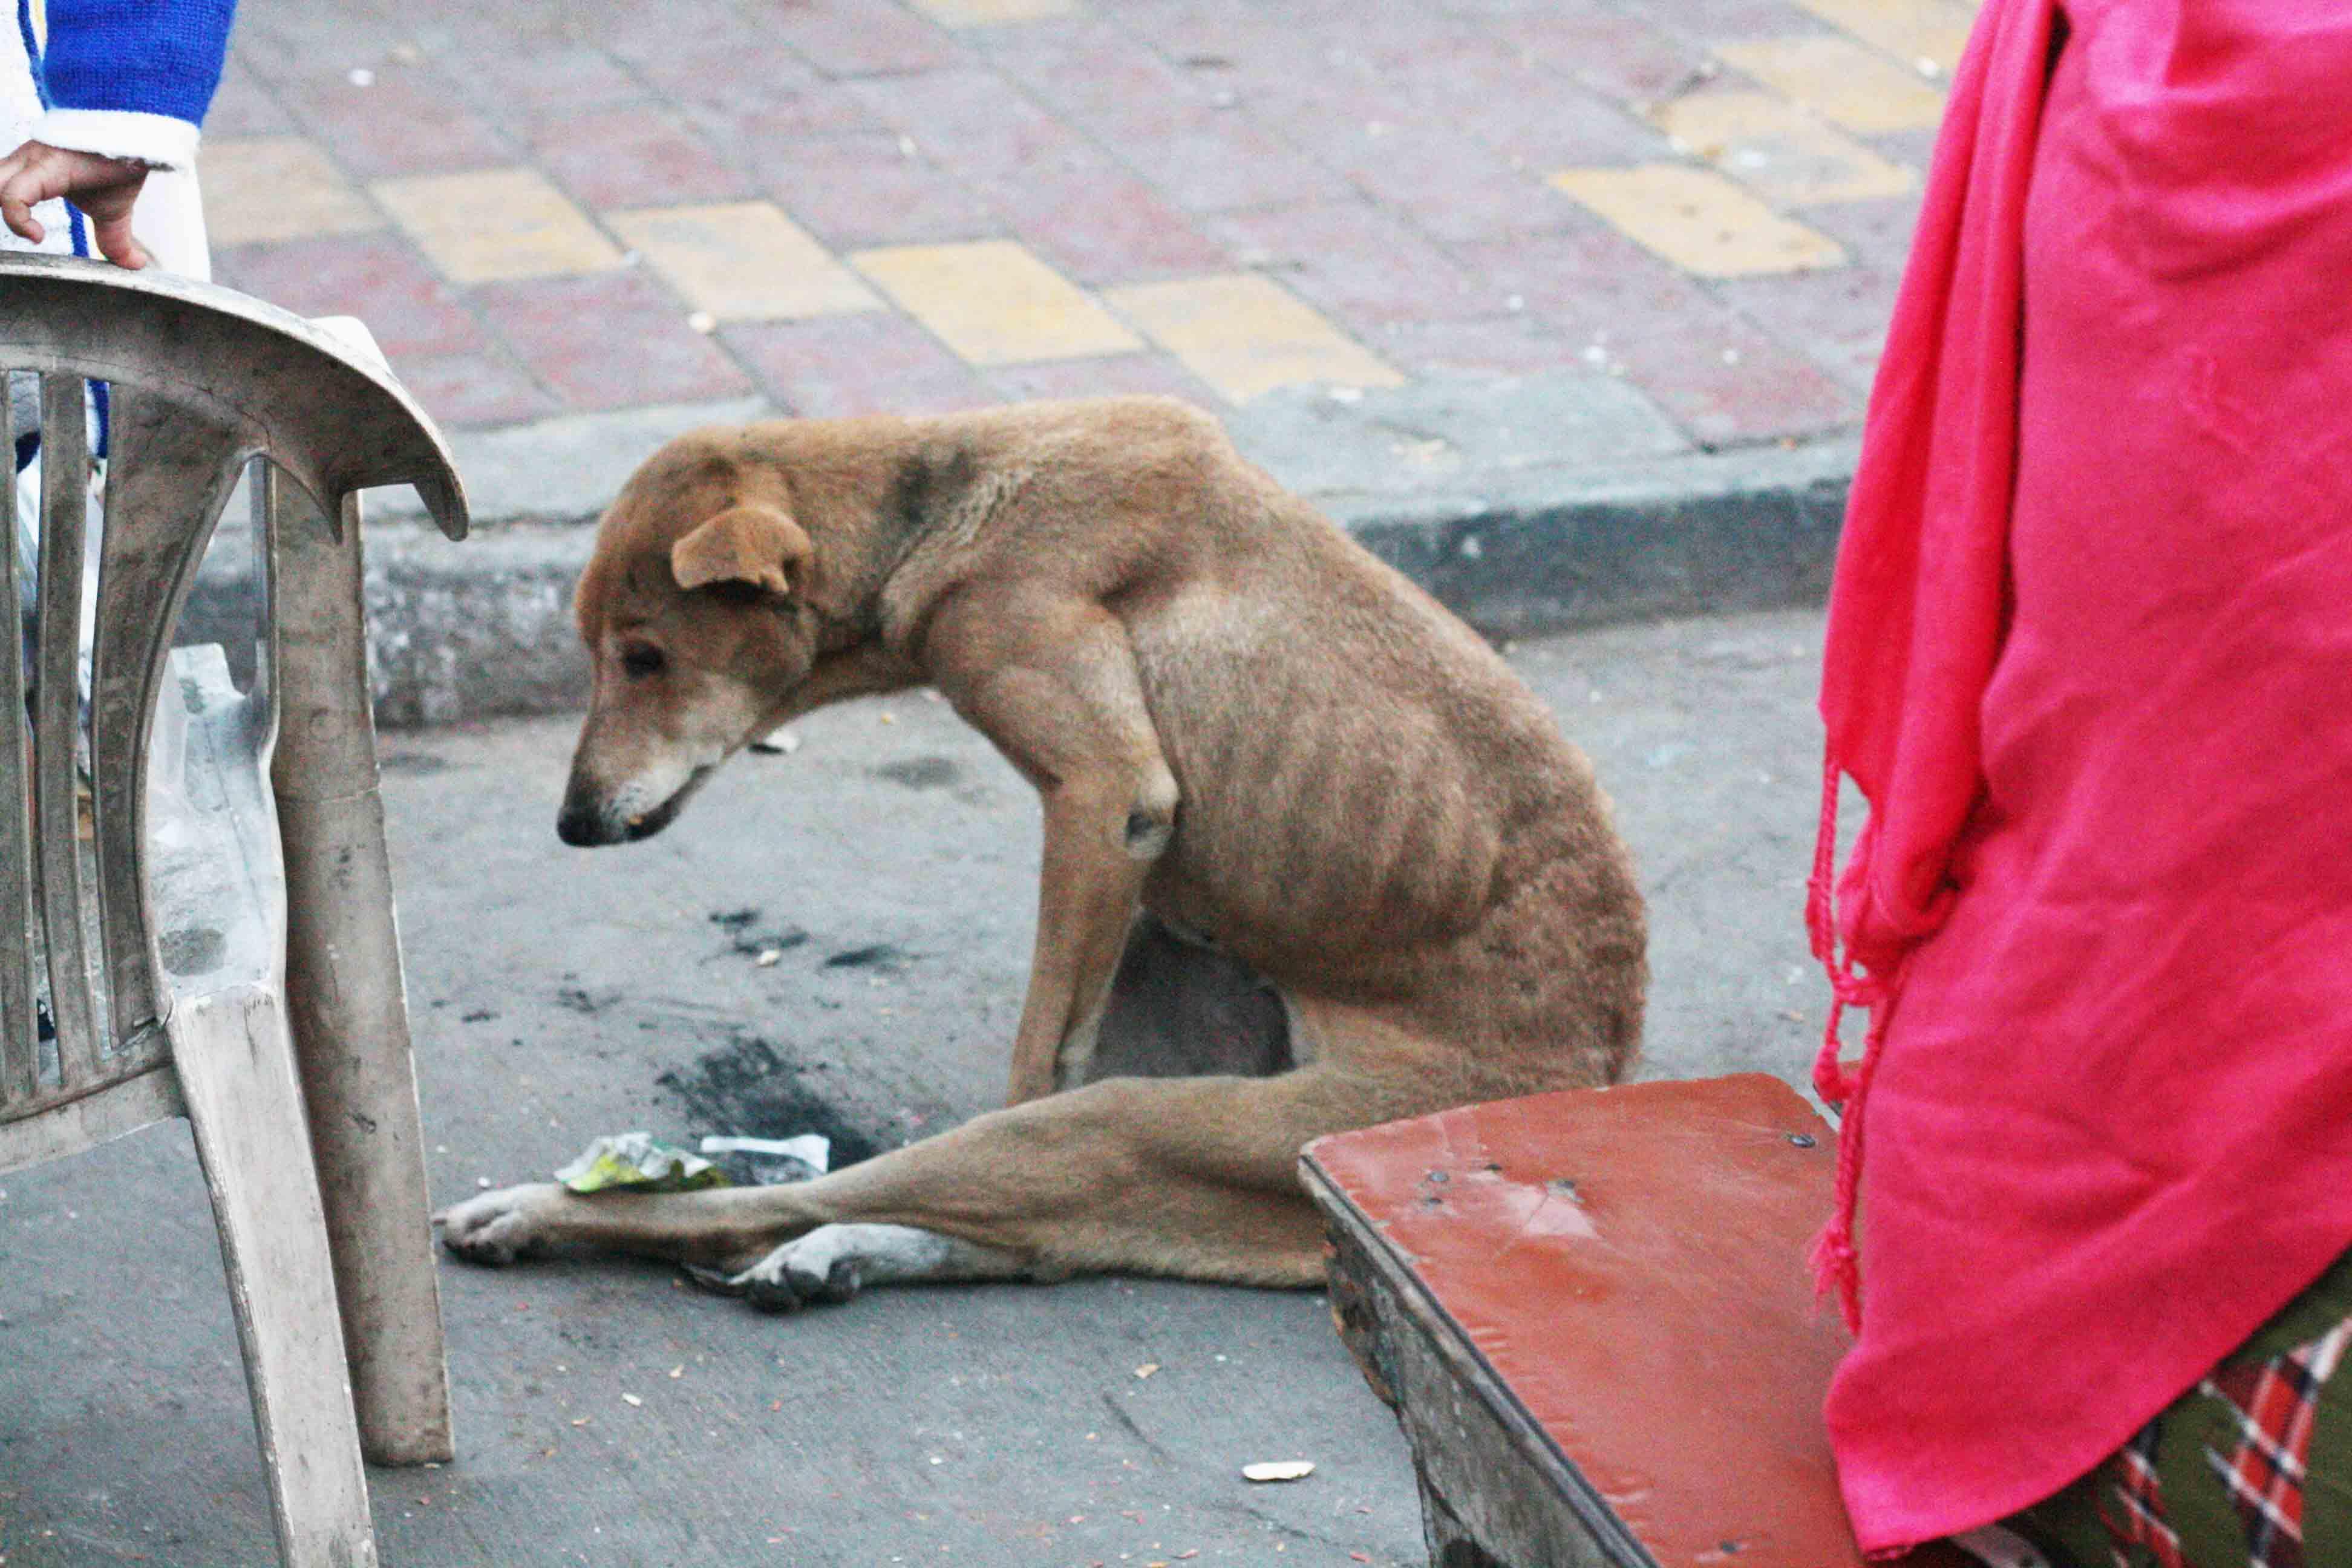 Mission Delhi – Julie, Hazrat Nizamuddin Basti